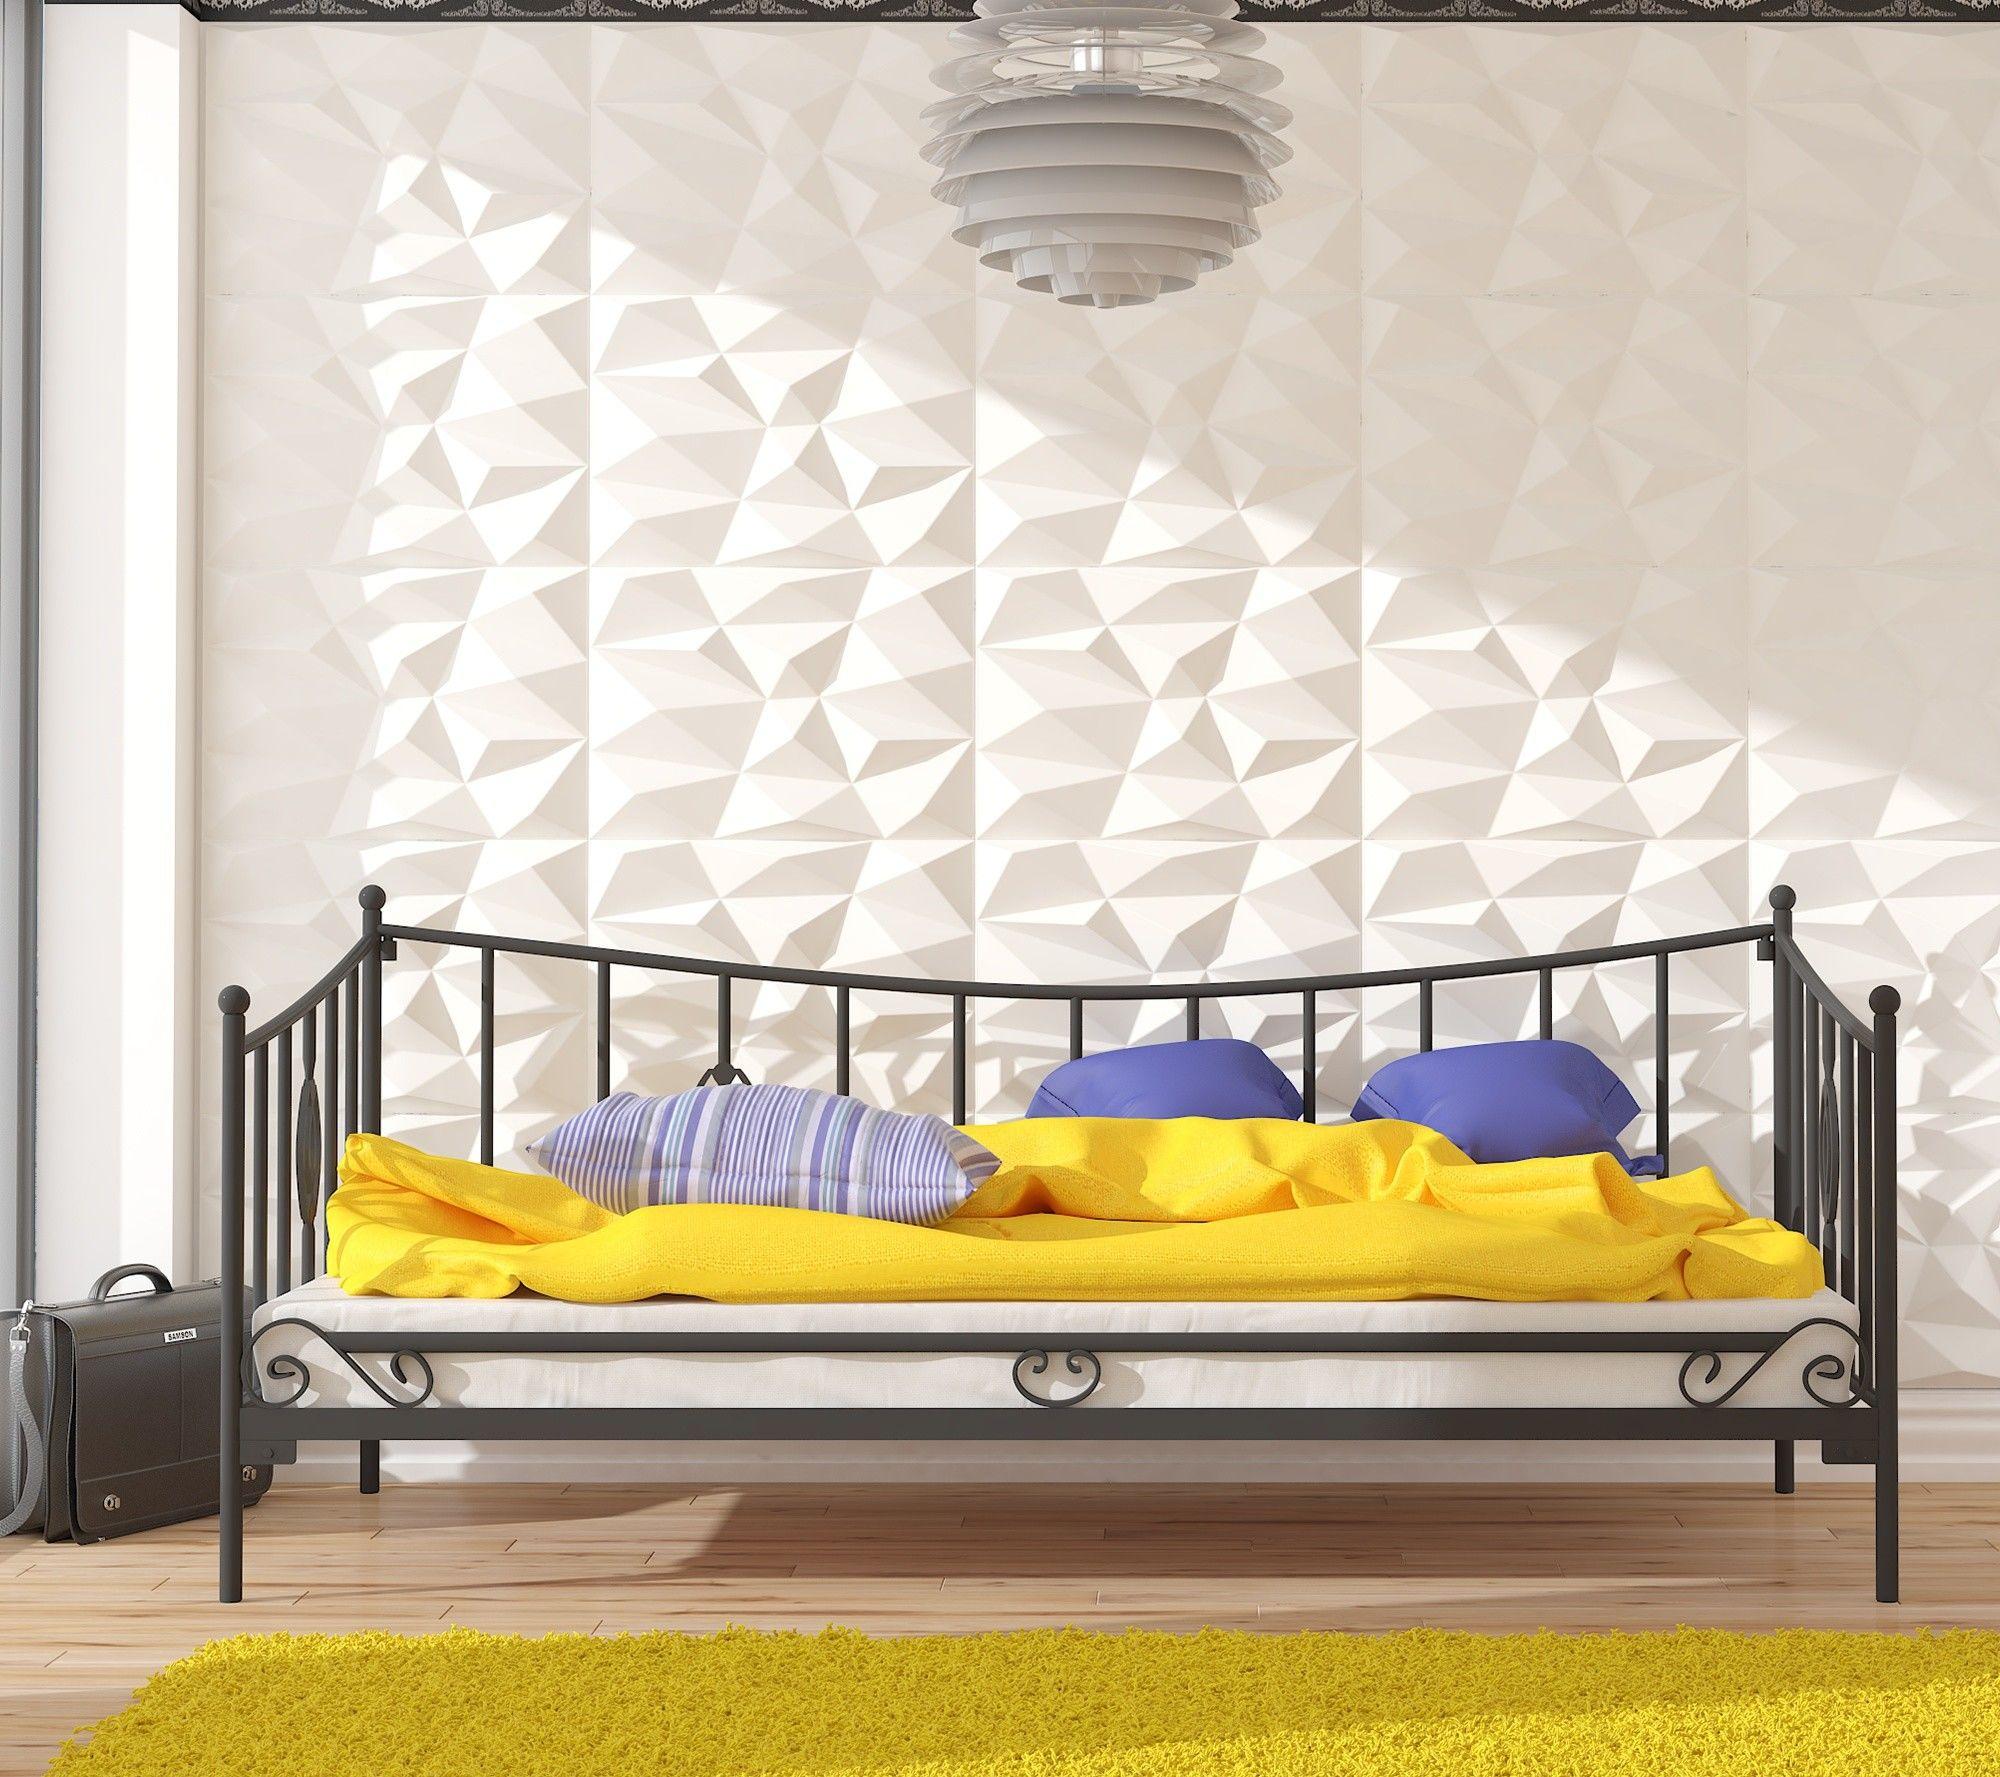 Łóżko metalowe sofa 80x190 wzór 31 ze stelażem